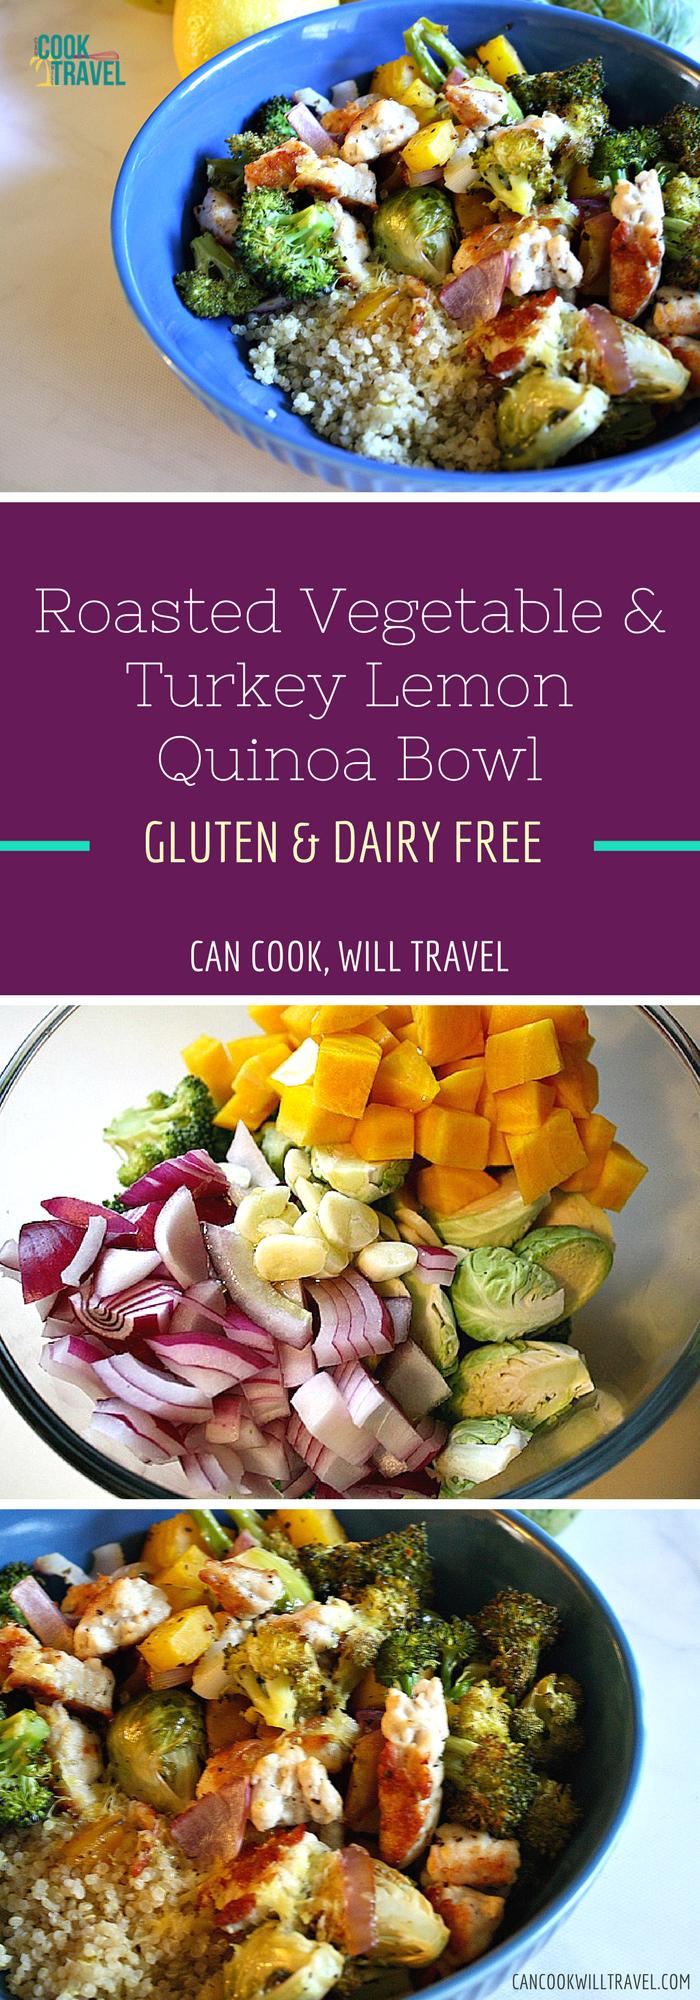 Roasted Veg & Turkey Lemon Quinoa Bowl_Collage2